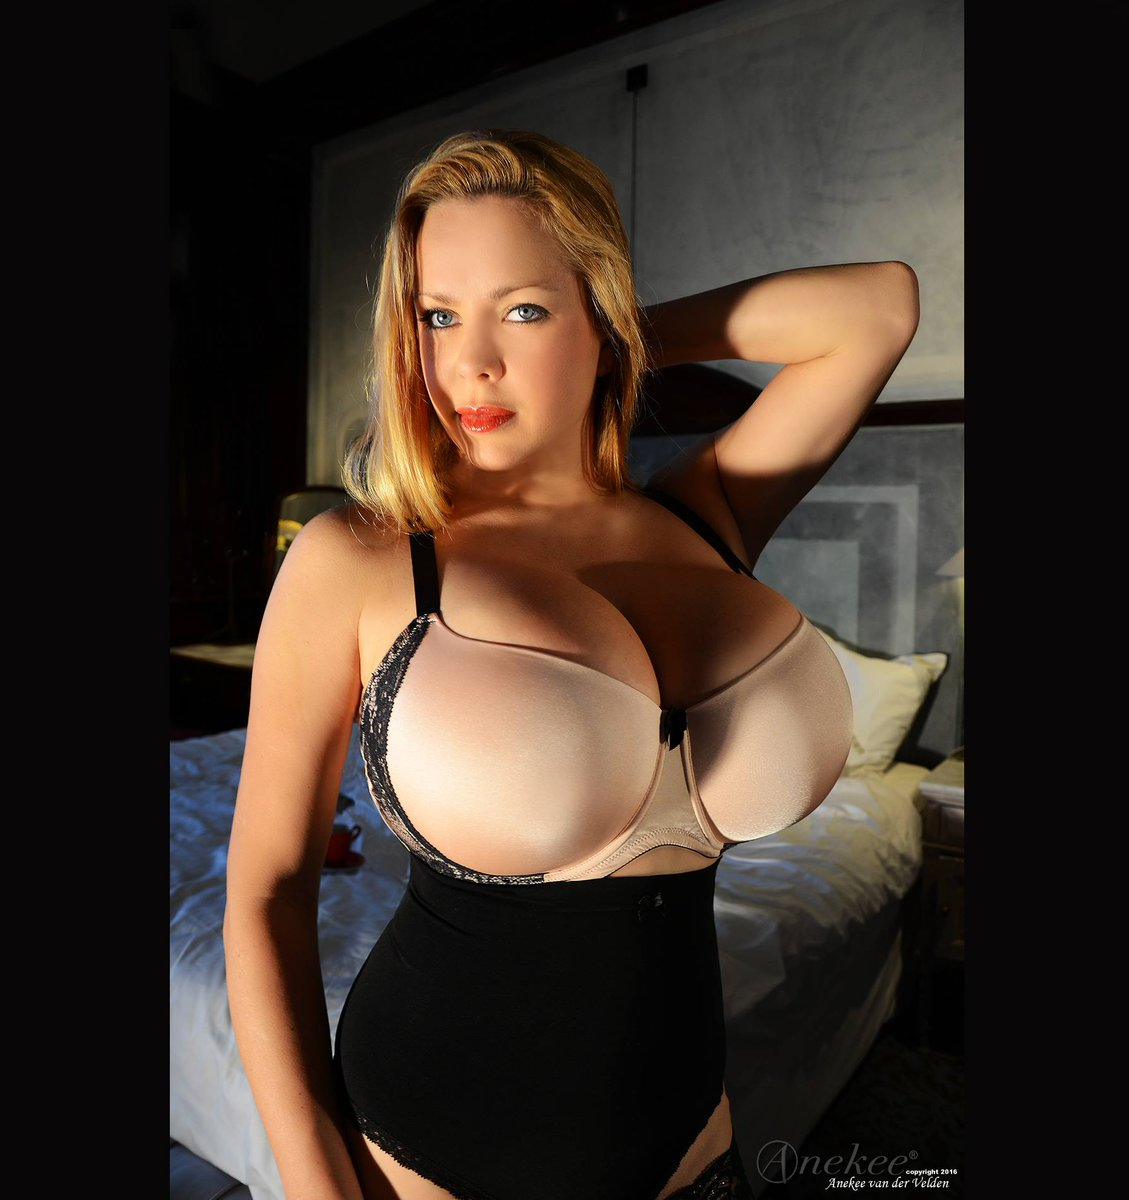 Big tit dwaf sex pics adult galleries